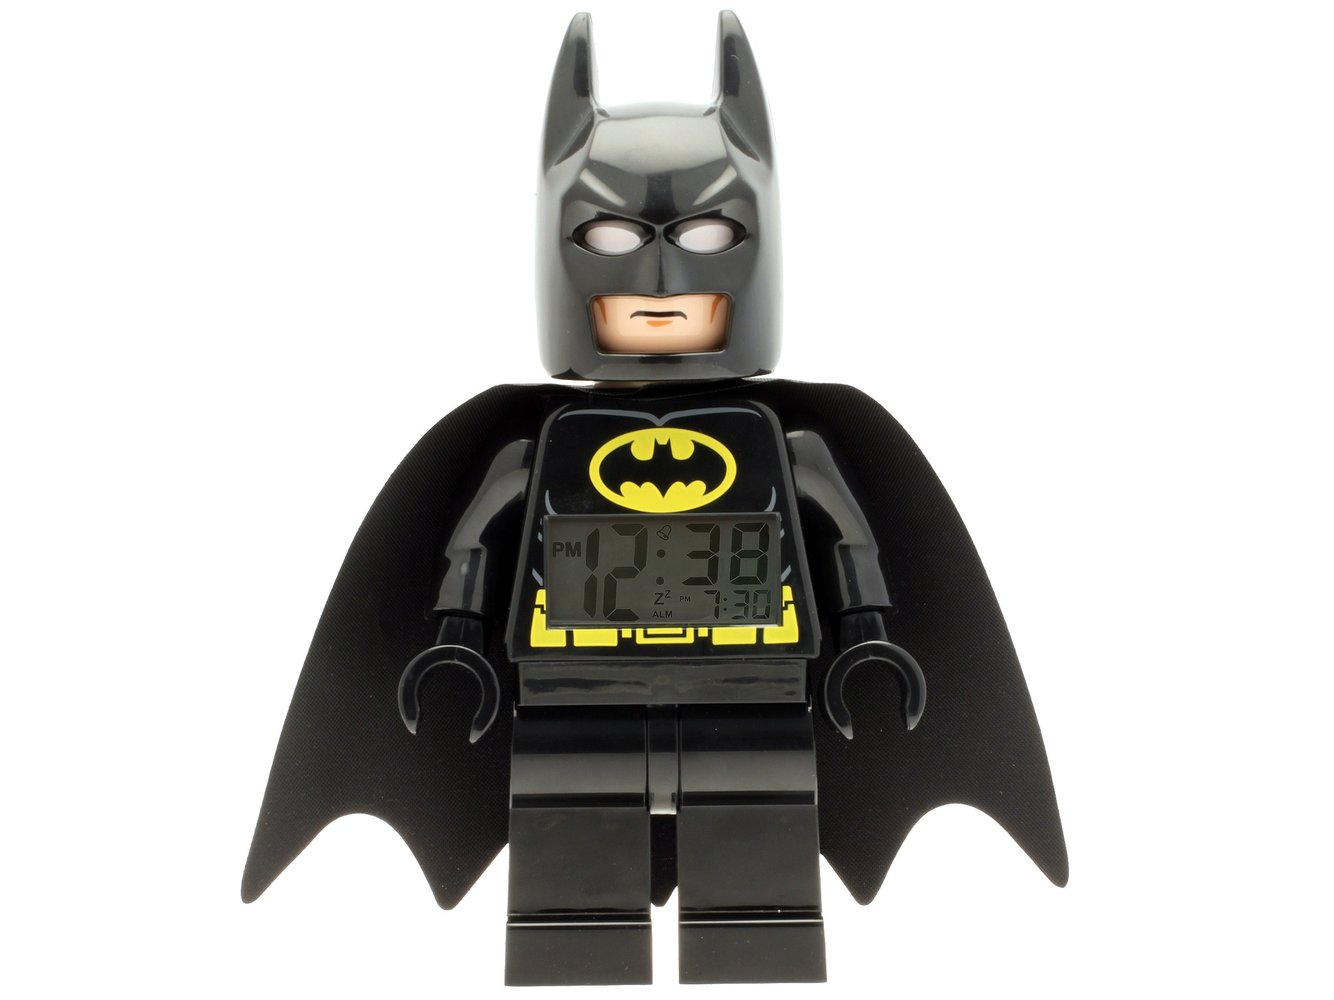 Batman Minifigure Clock